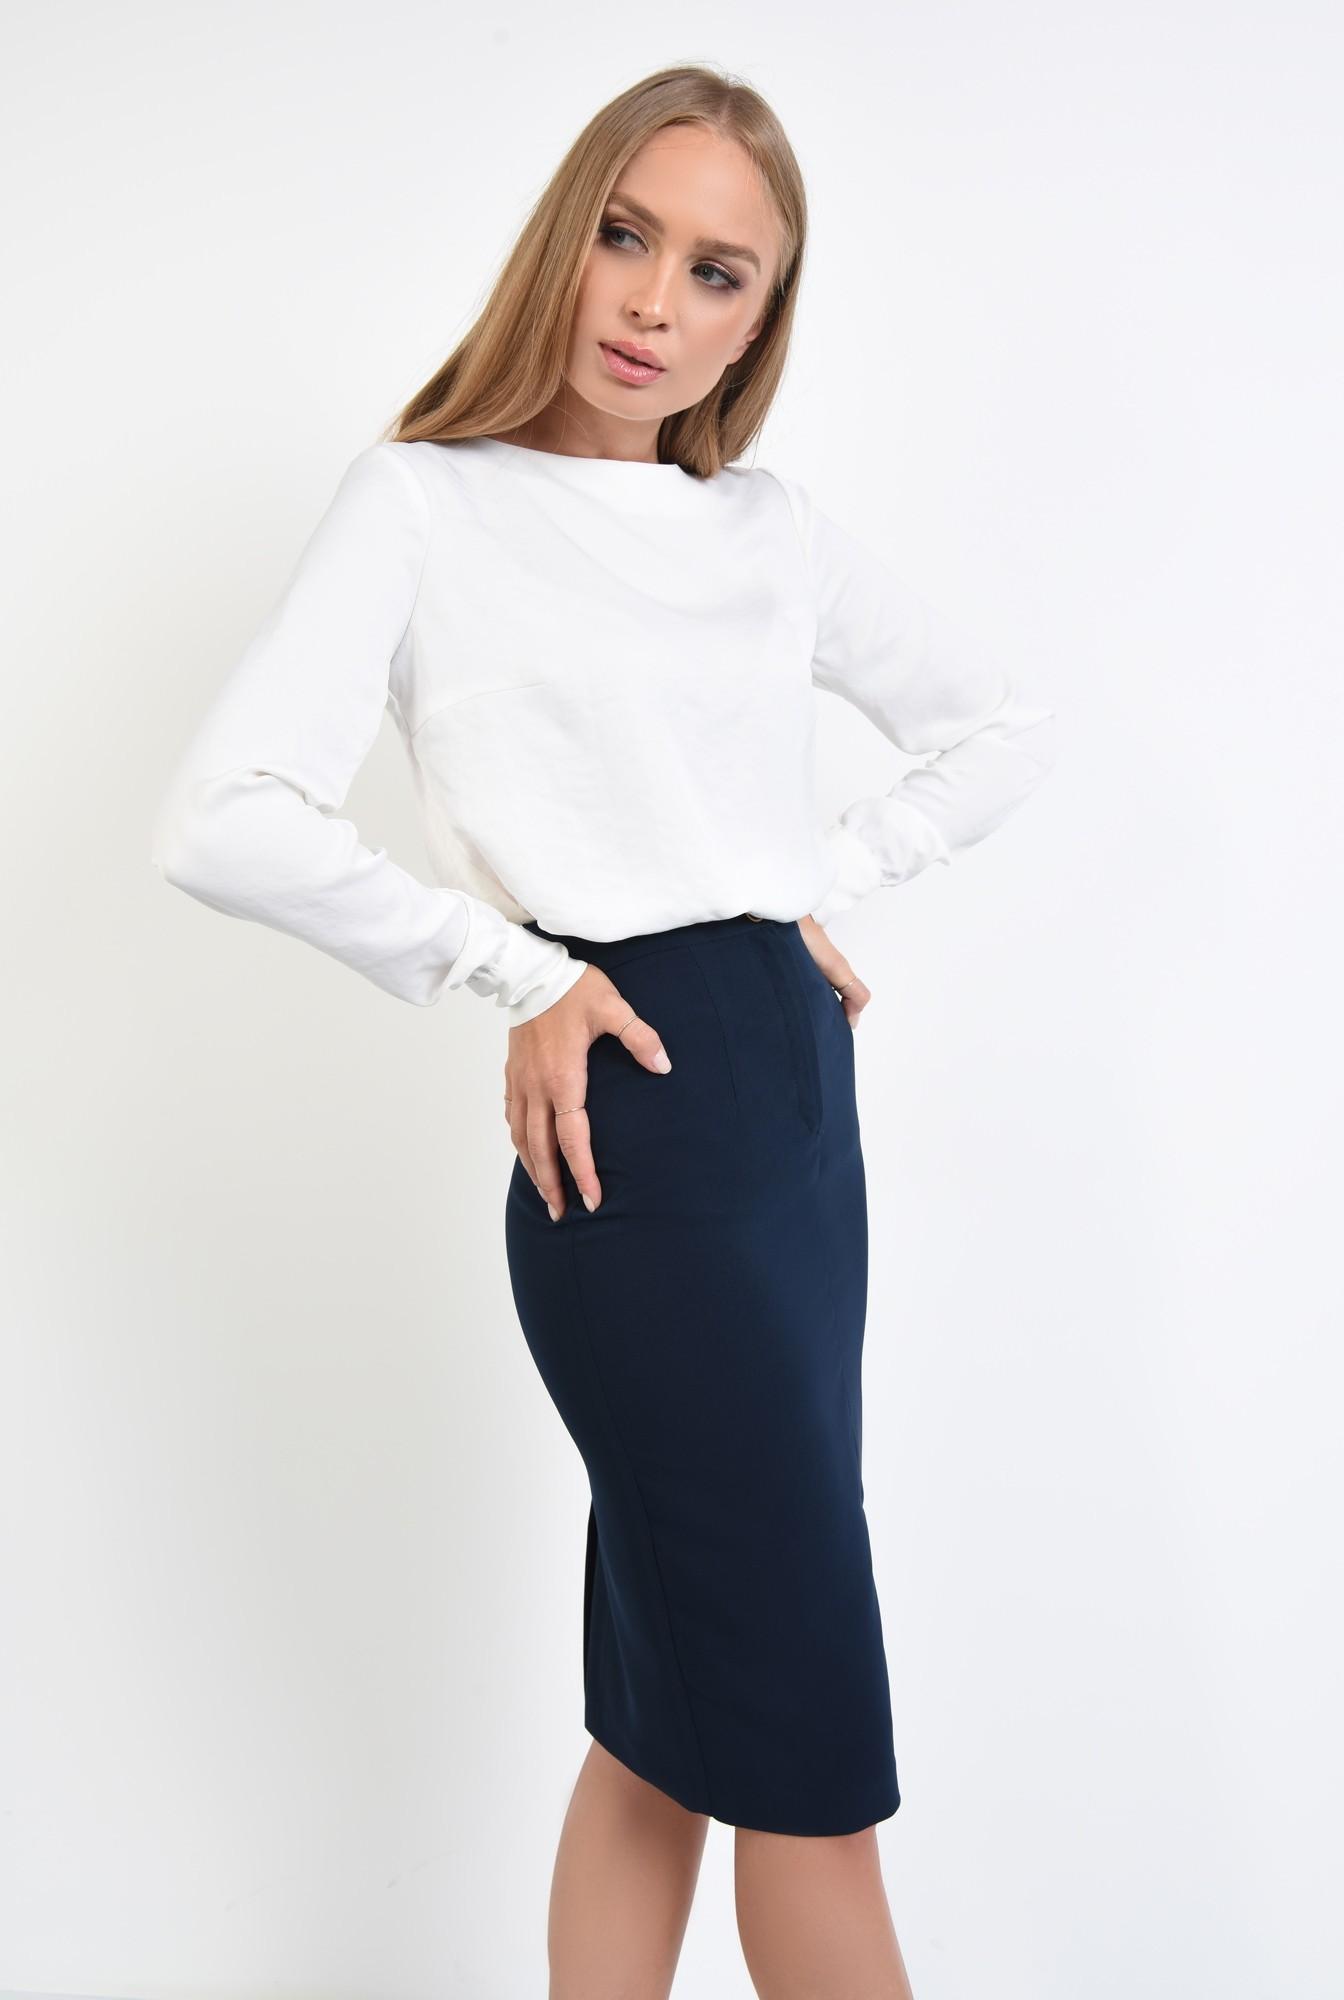 2 - 360 - bluza casual, dreapta, lejera, nasturi decorativi metalici, bluze dama